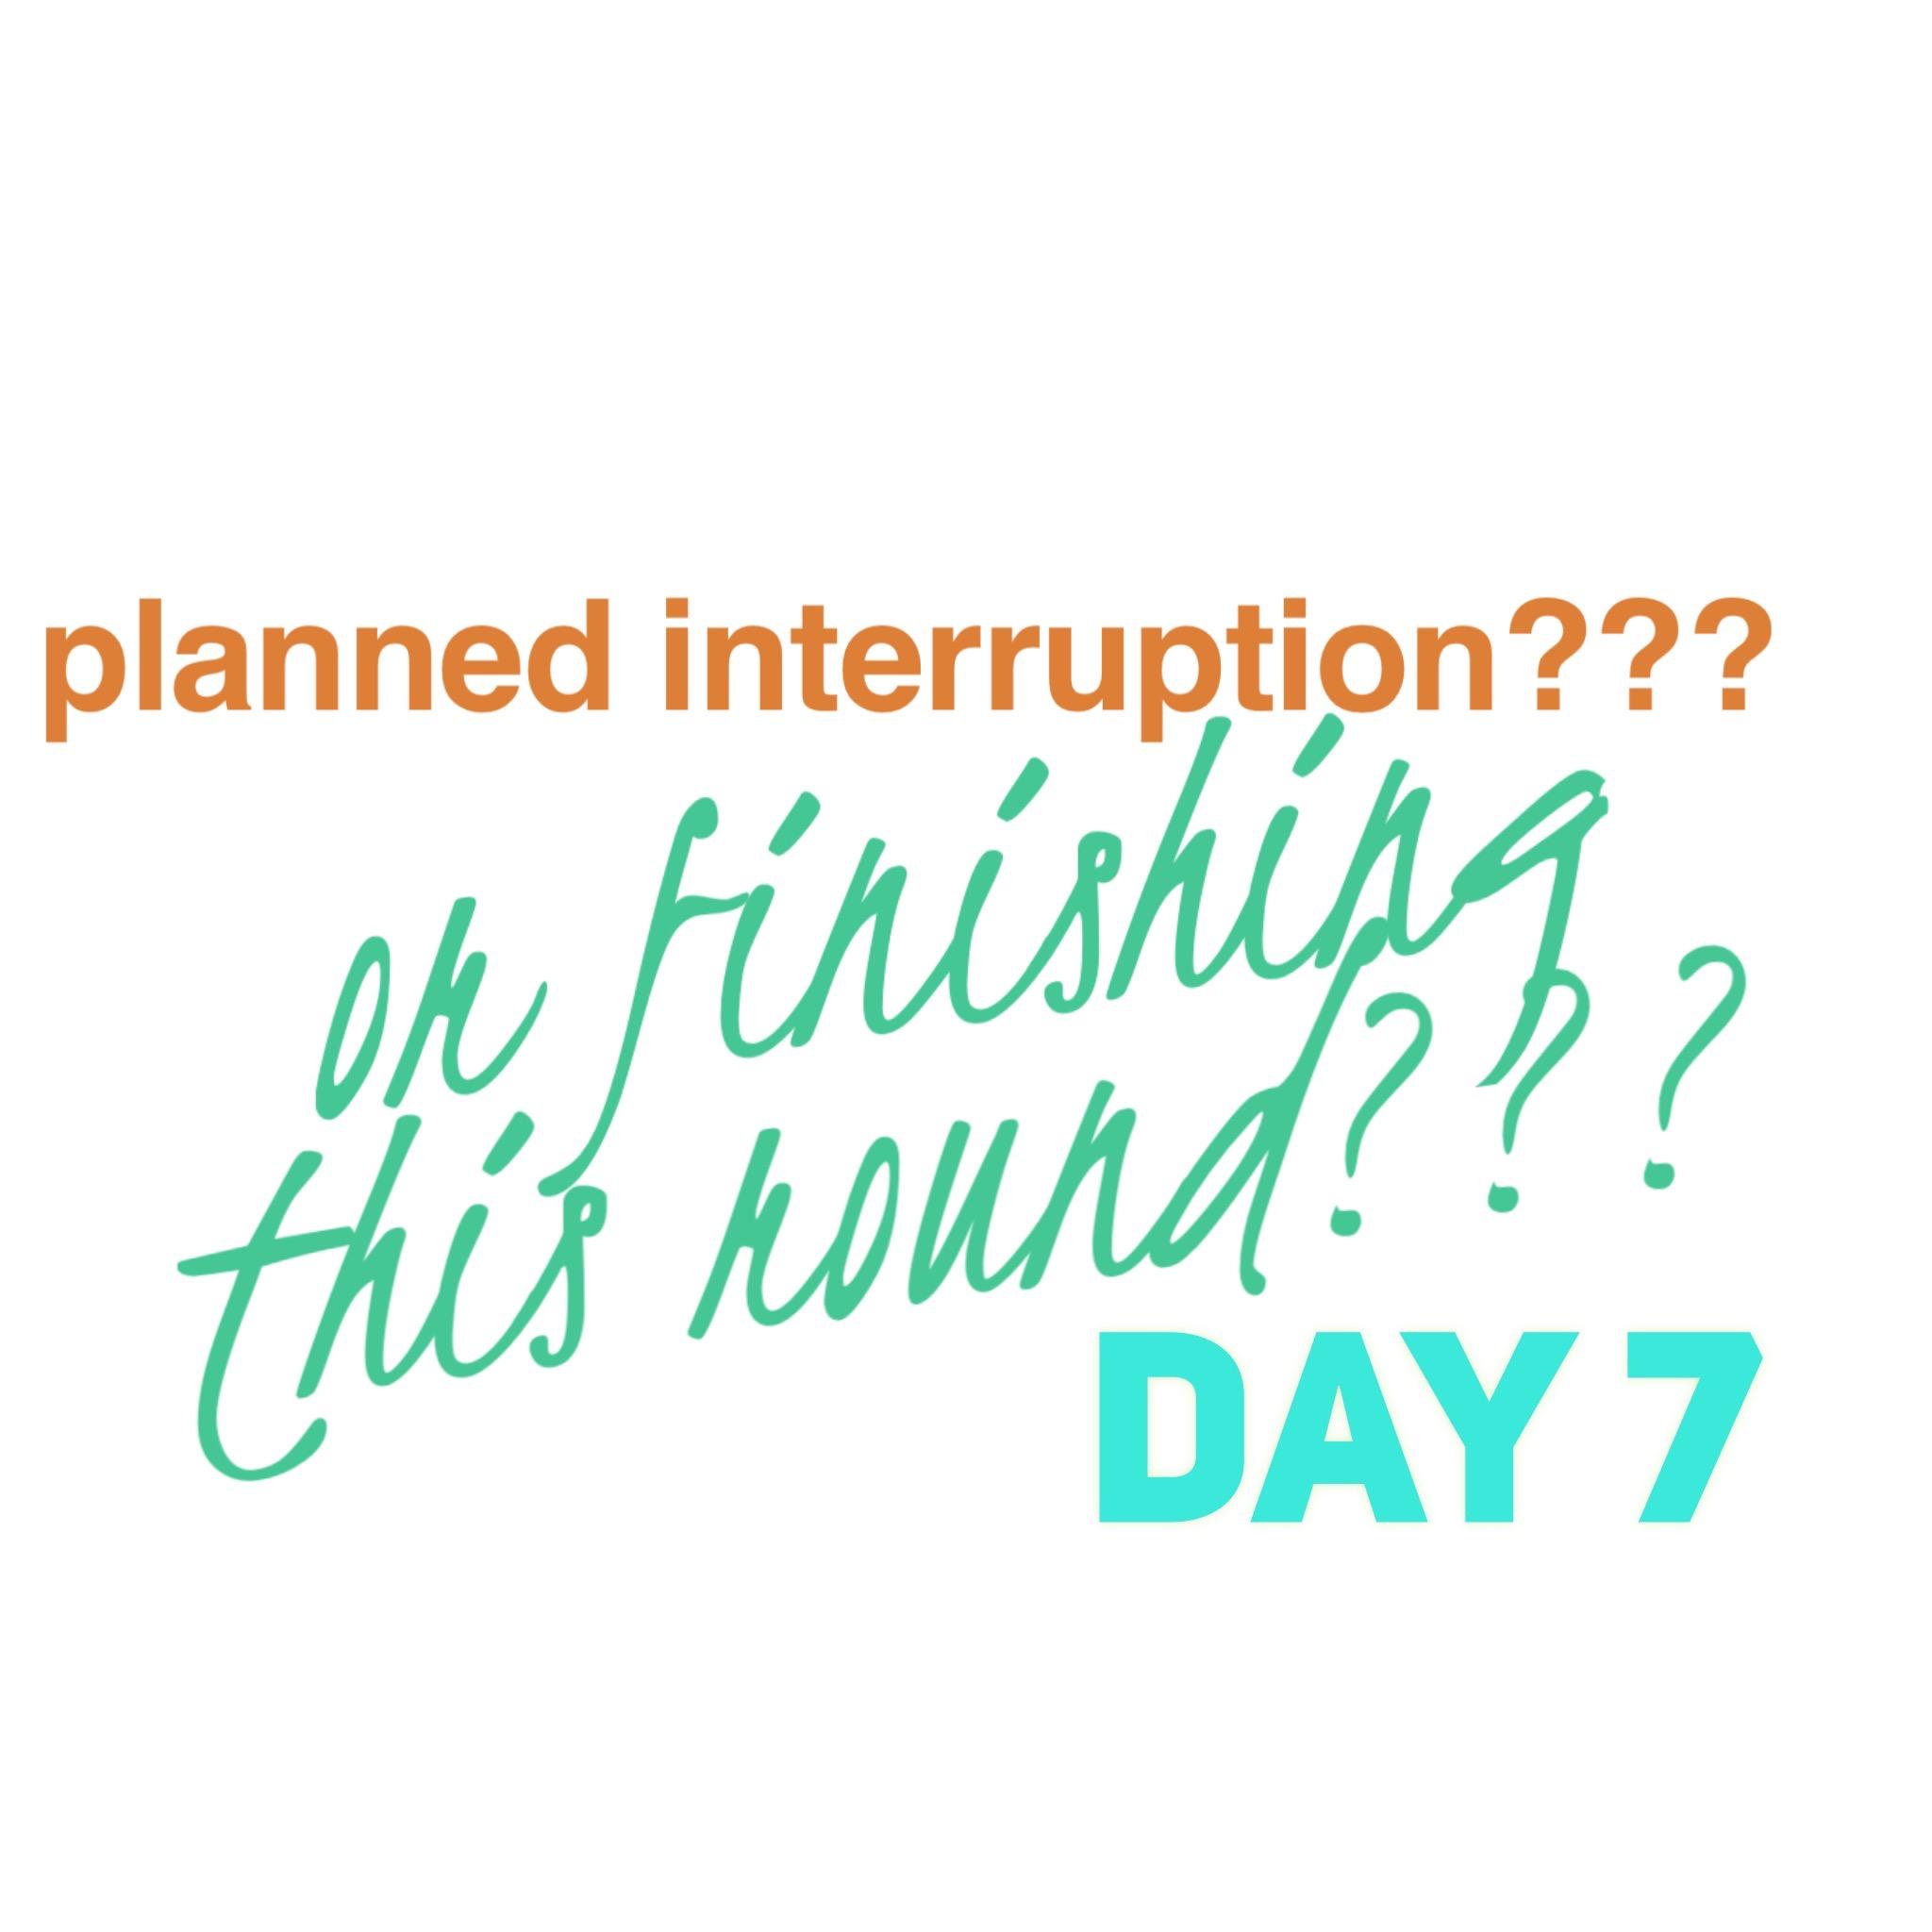 PI  Day 7 (P2R2)